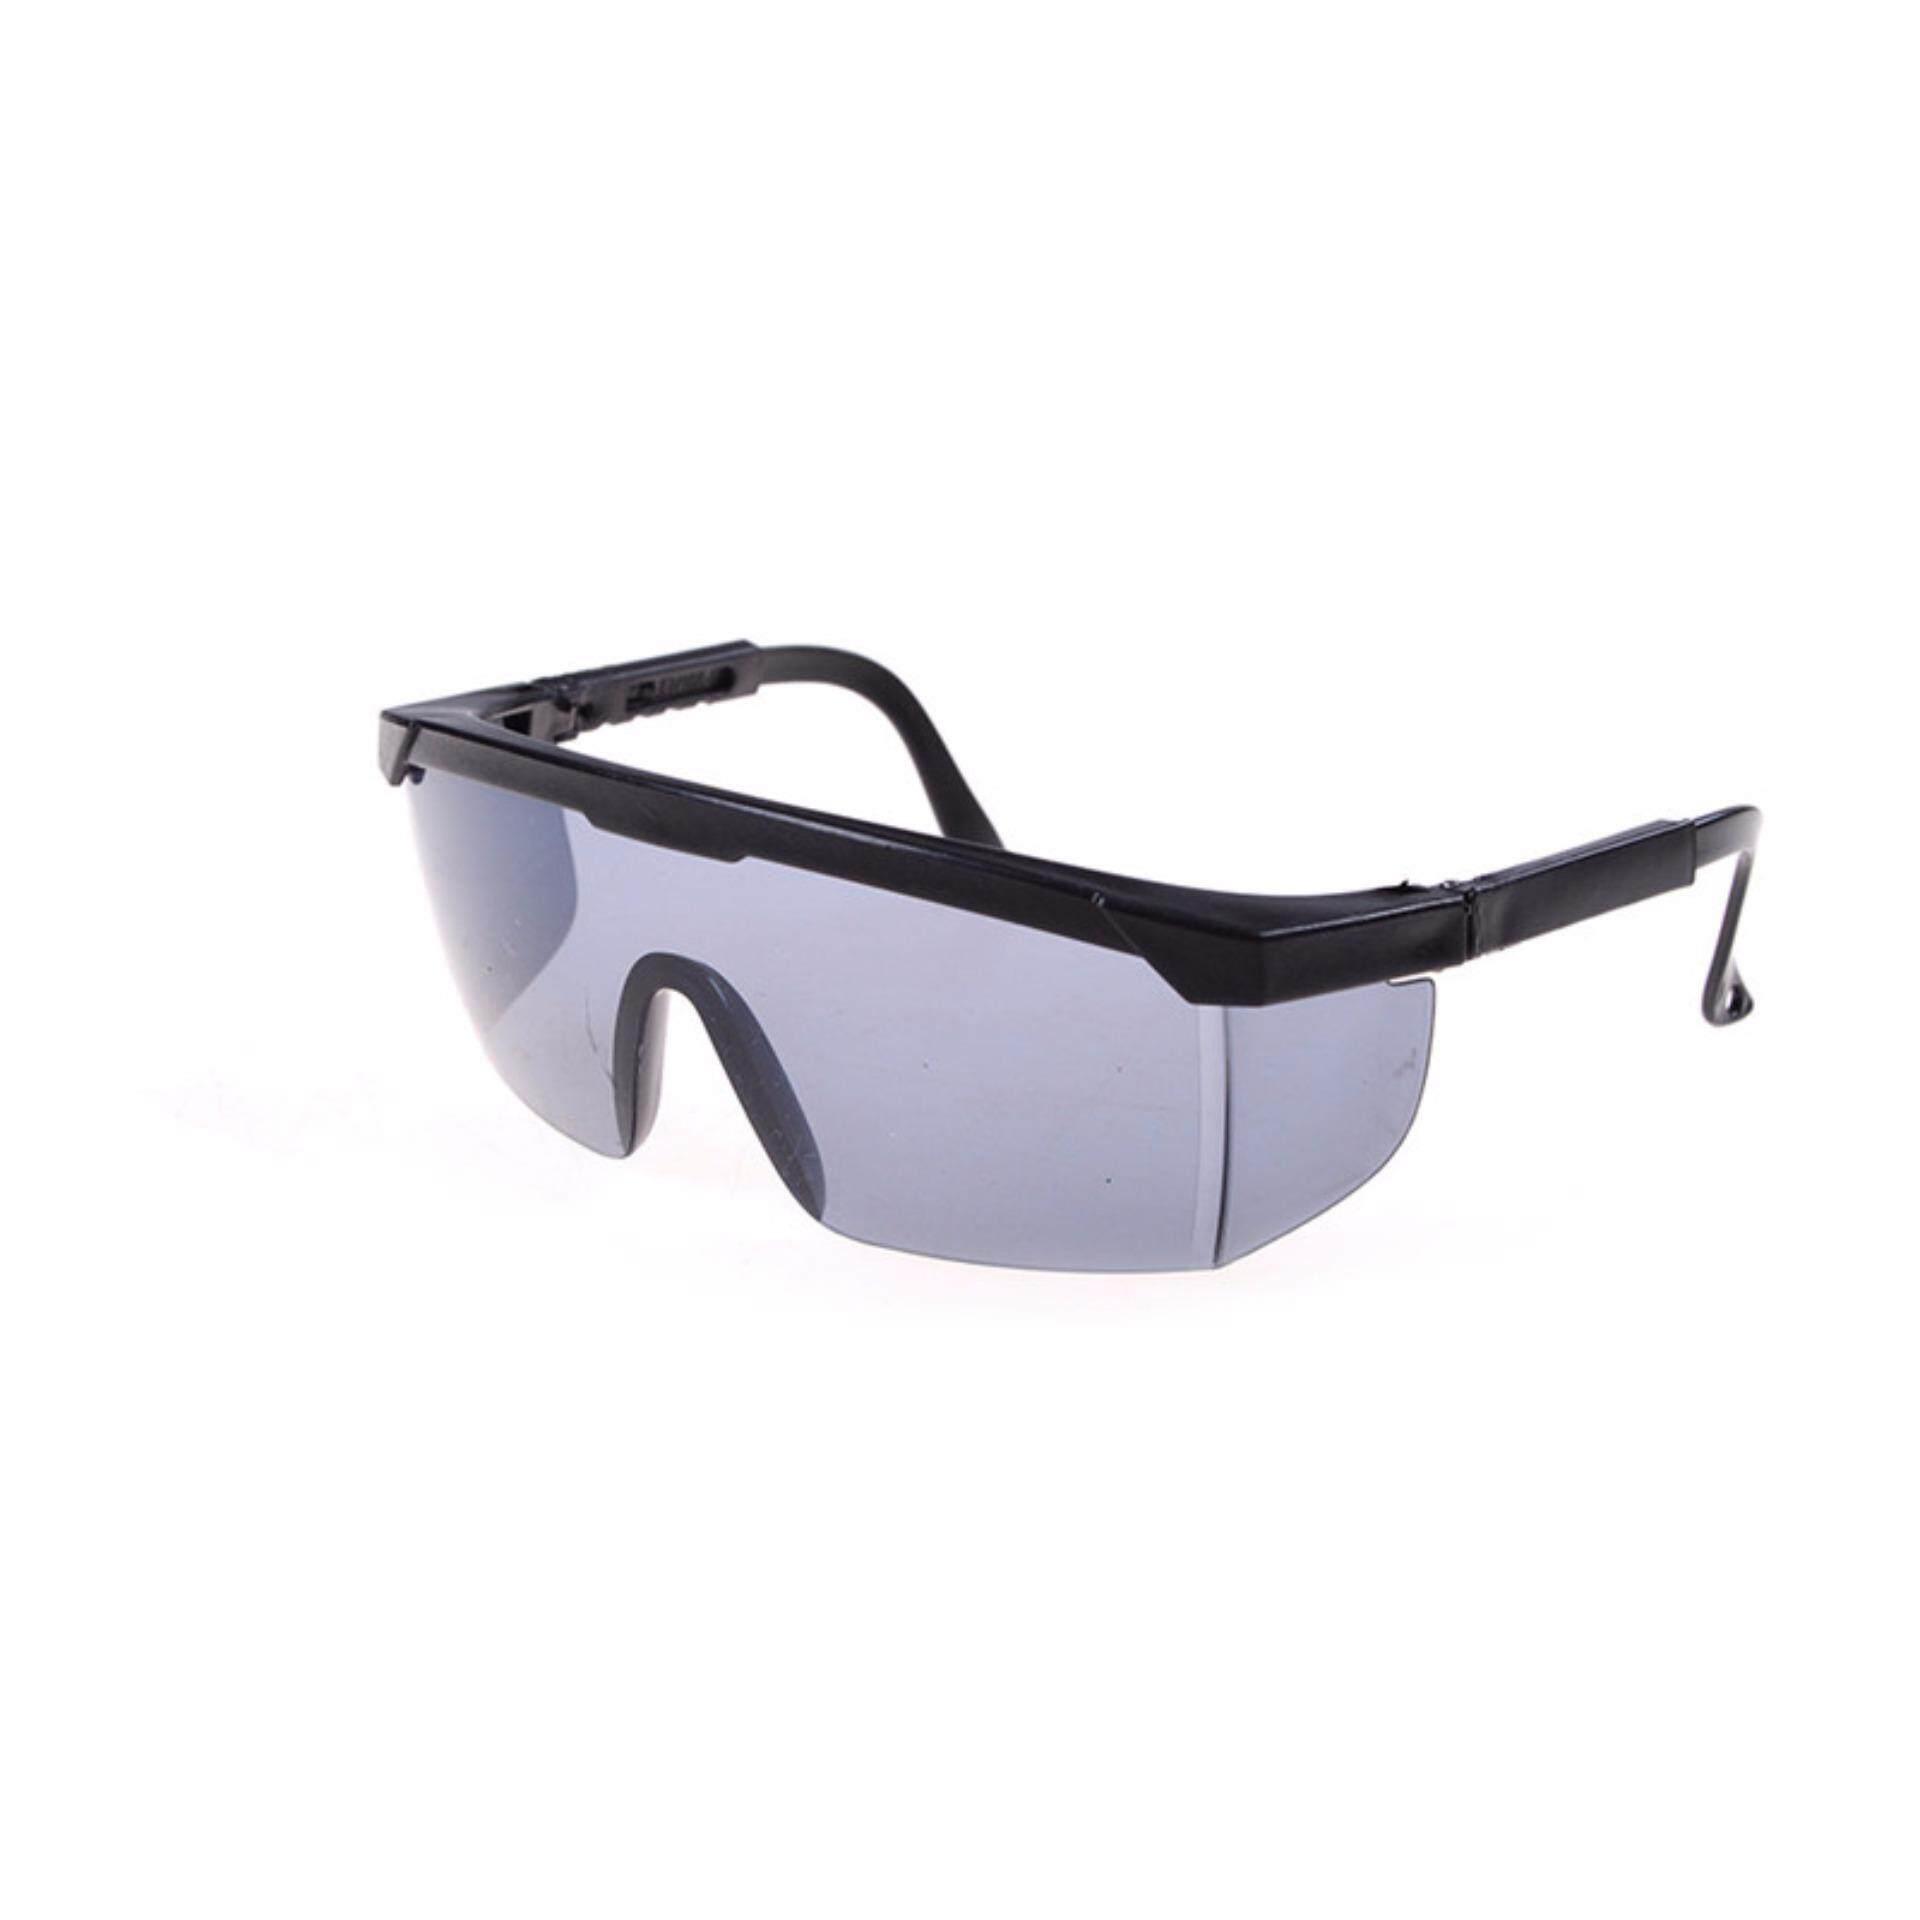 Safety Glasses Goggle for Nerf Gun Eyewear Eye Protection Soft Toy Gun Game Black Grey